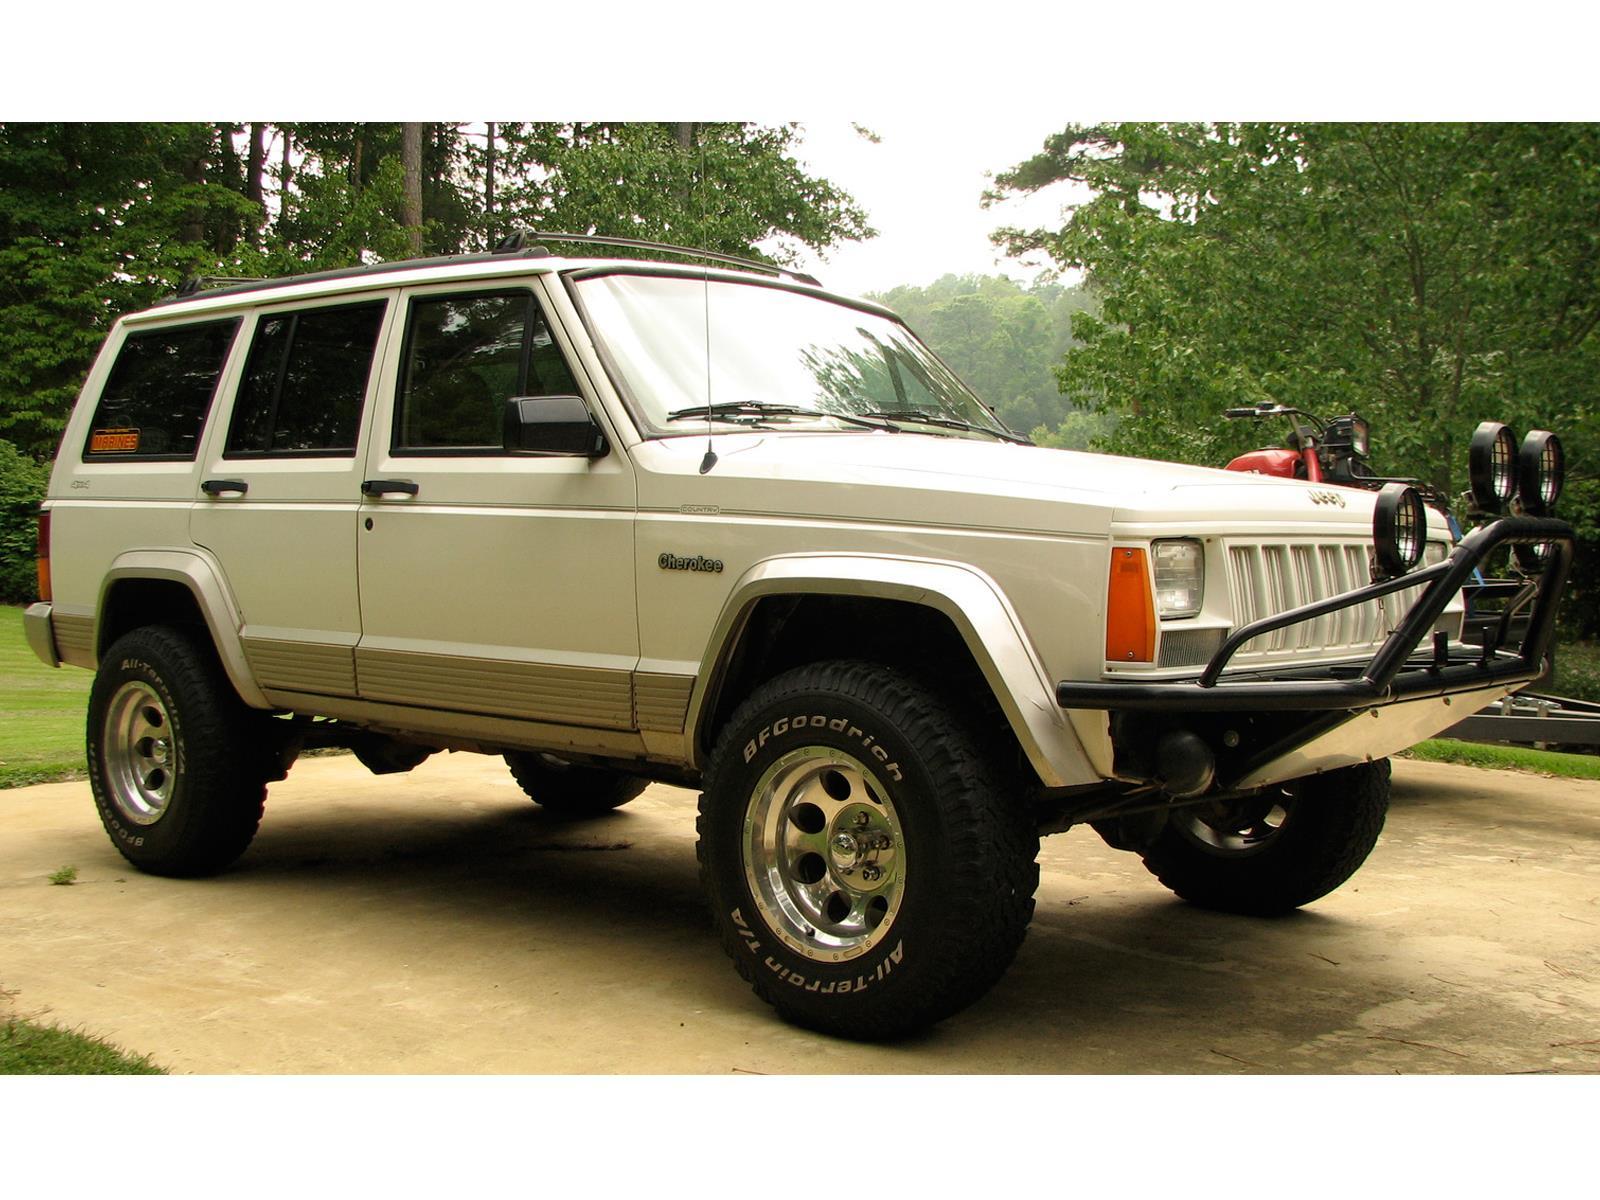 Jeep Cherokee / Grand Cherokee - Autocosmos.com